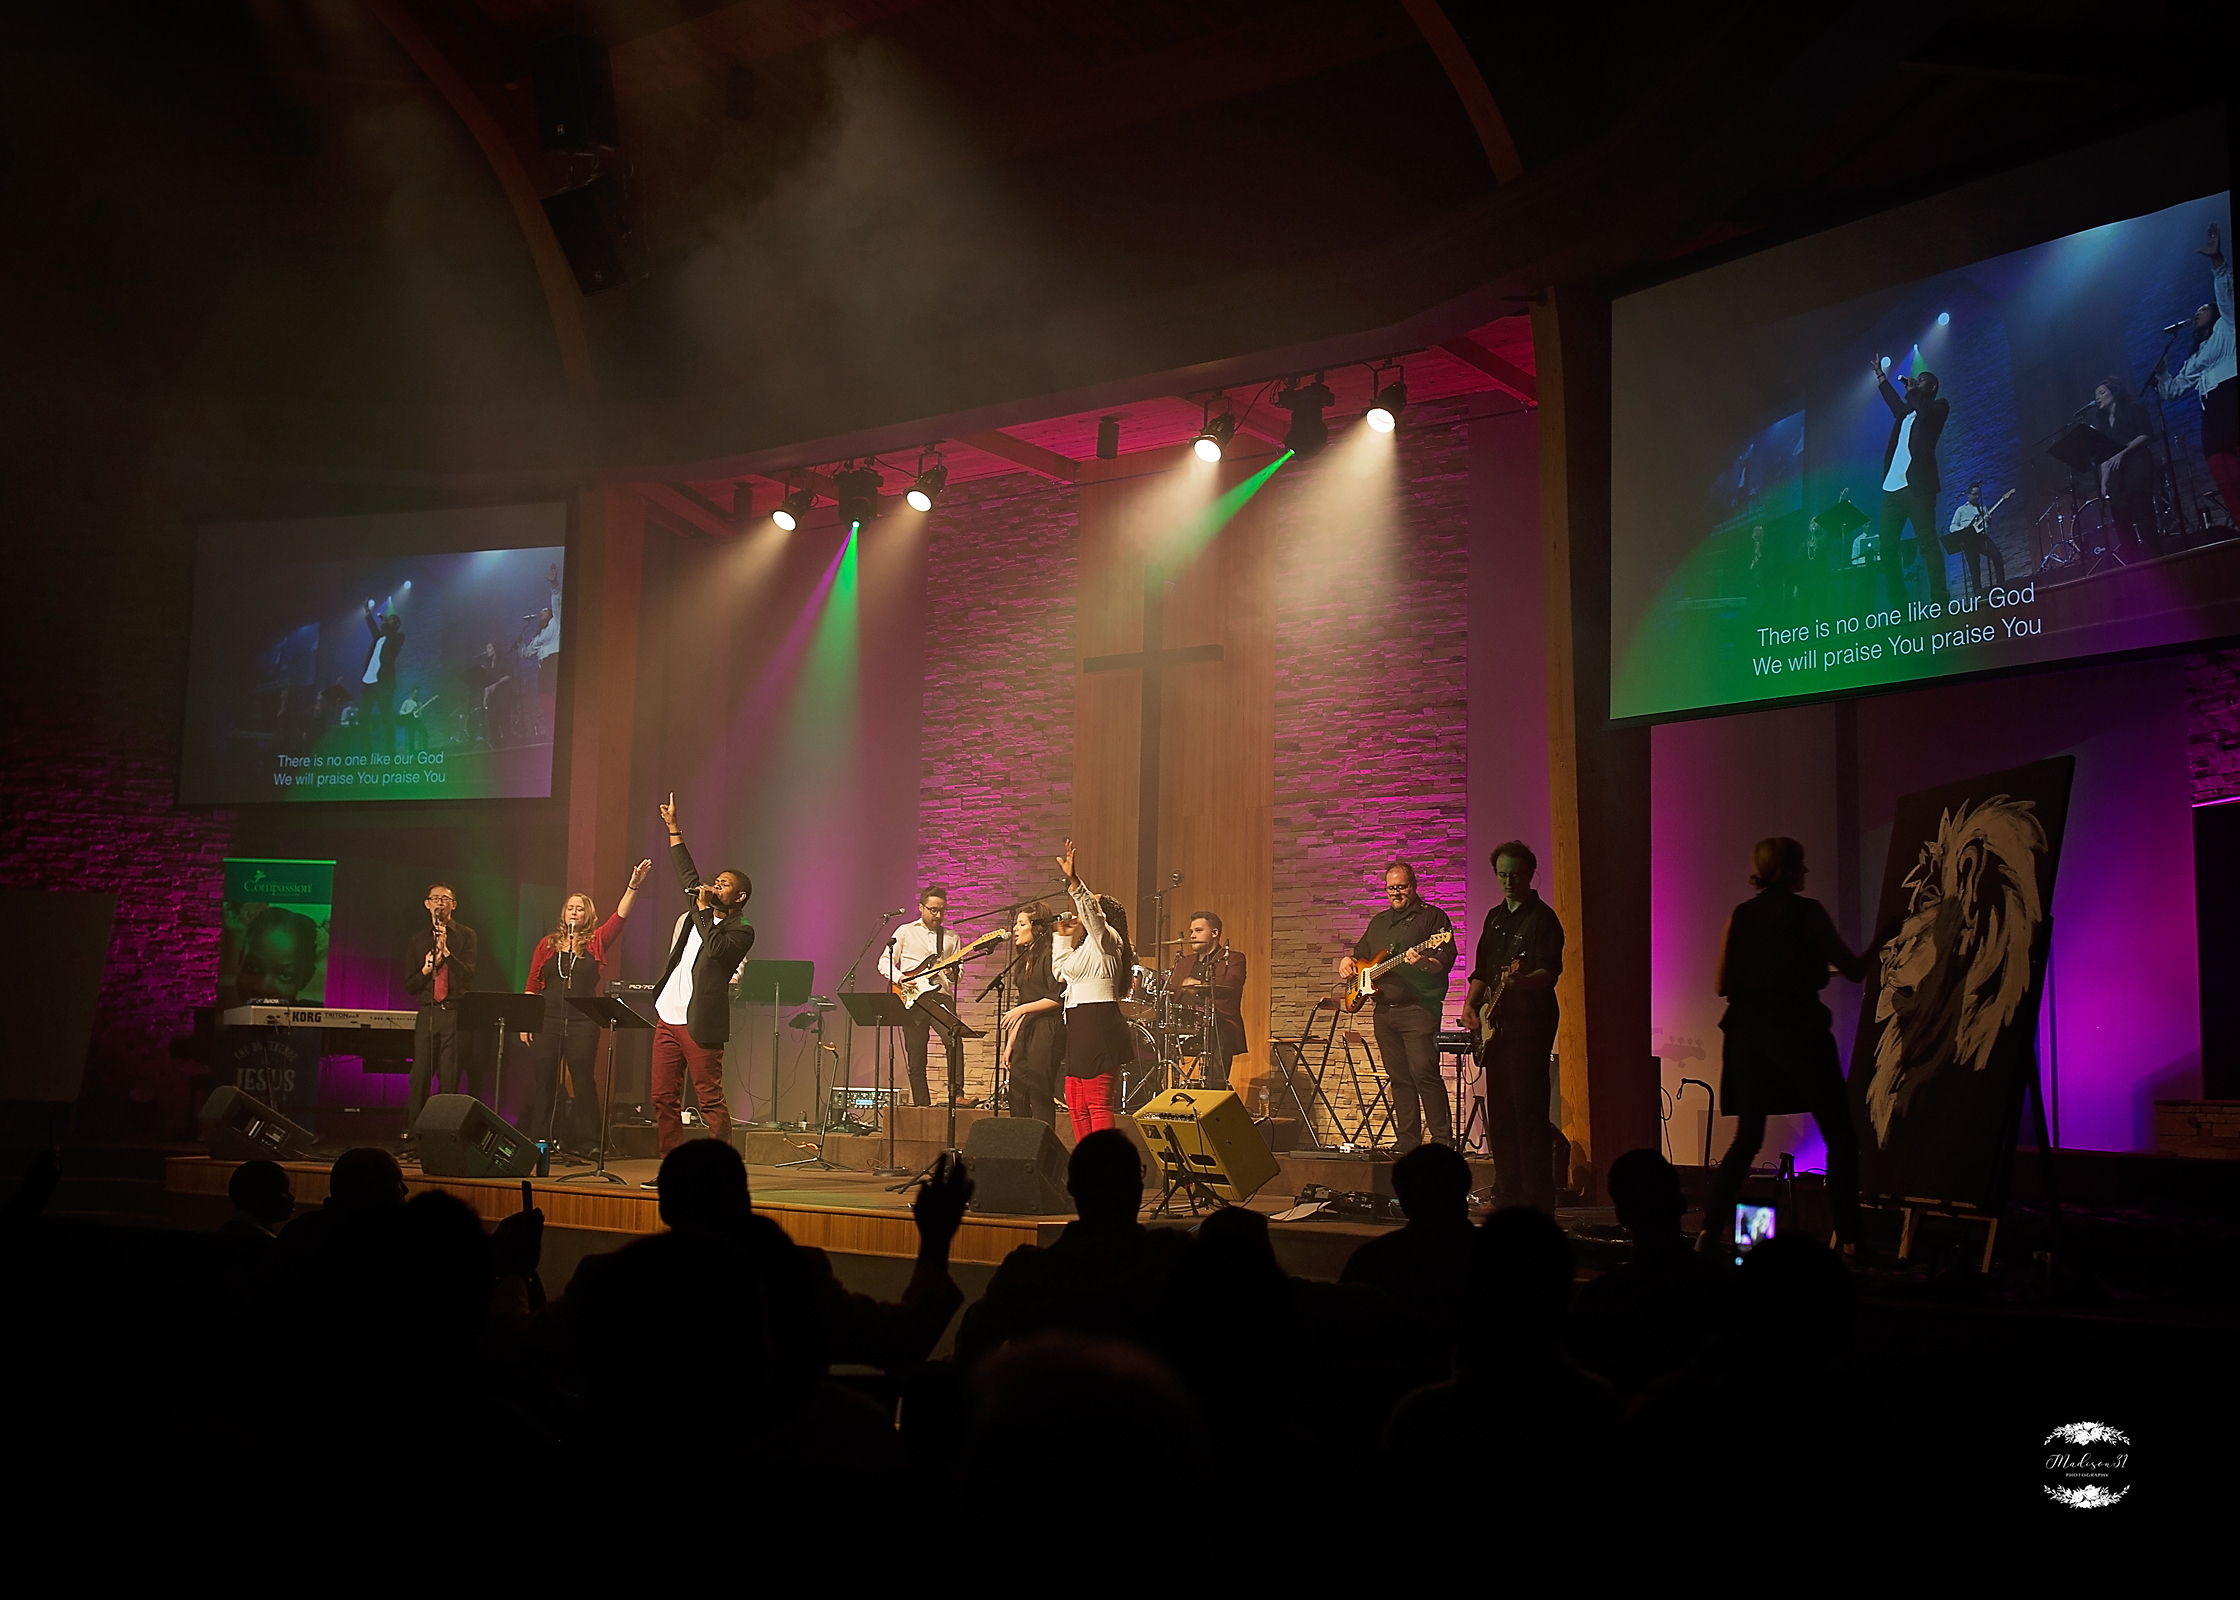 A night of Love&Worship_0254 copy.jpg